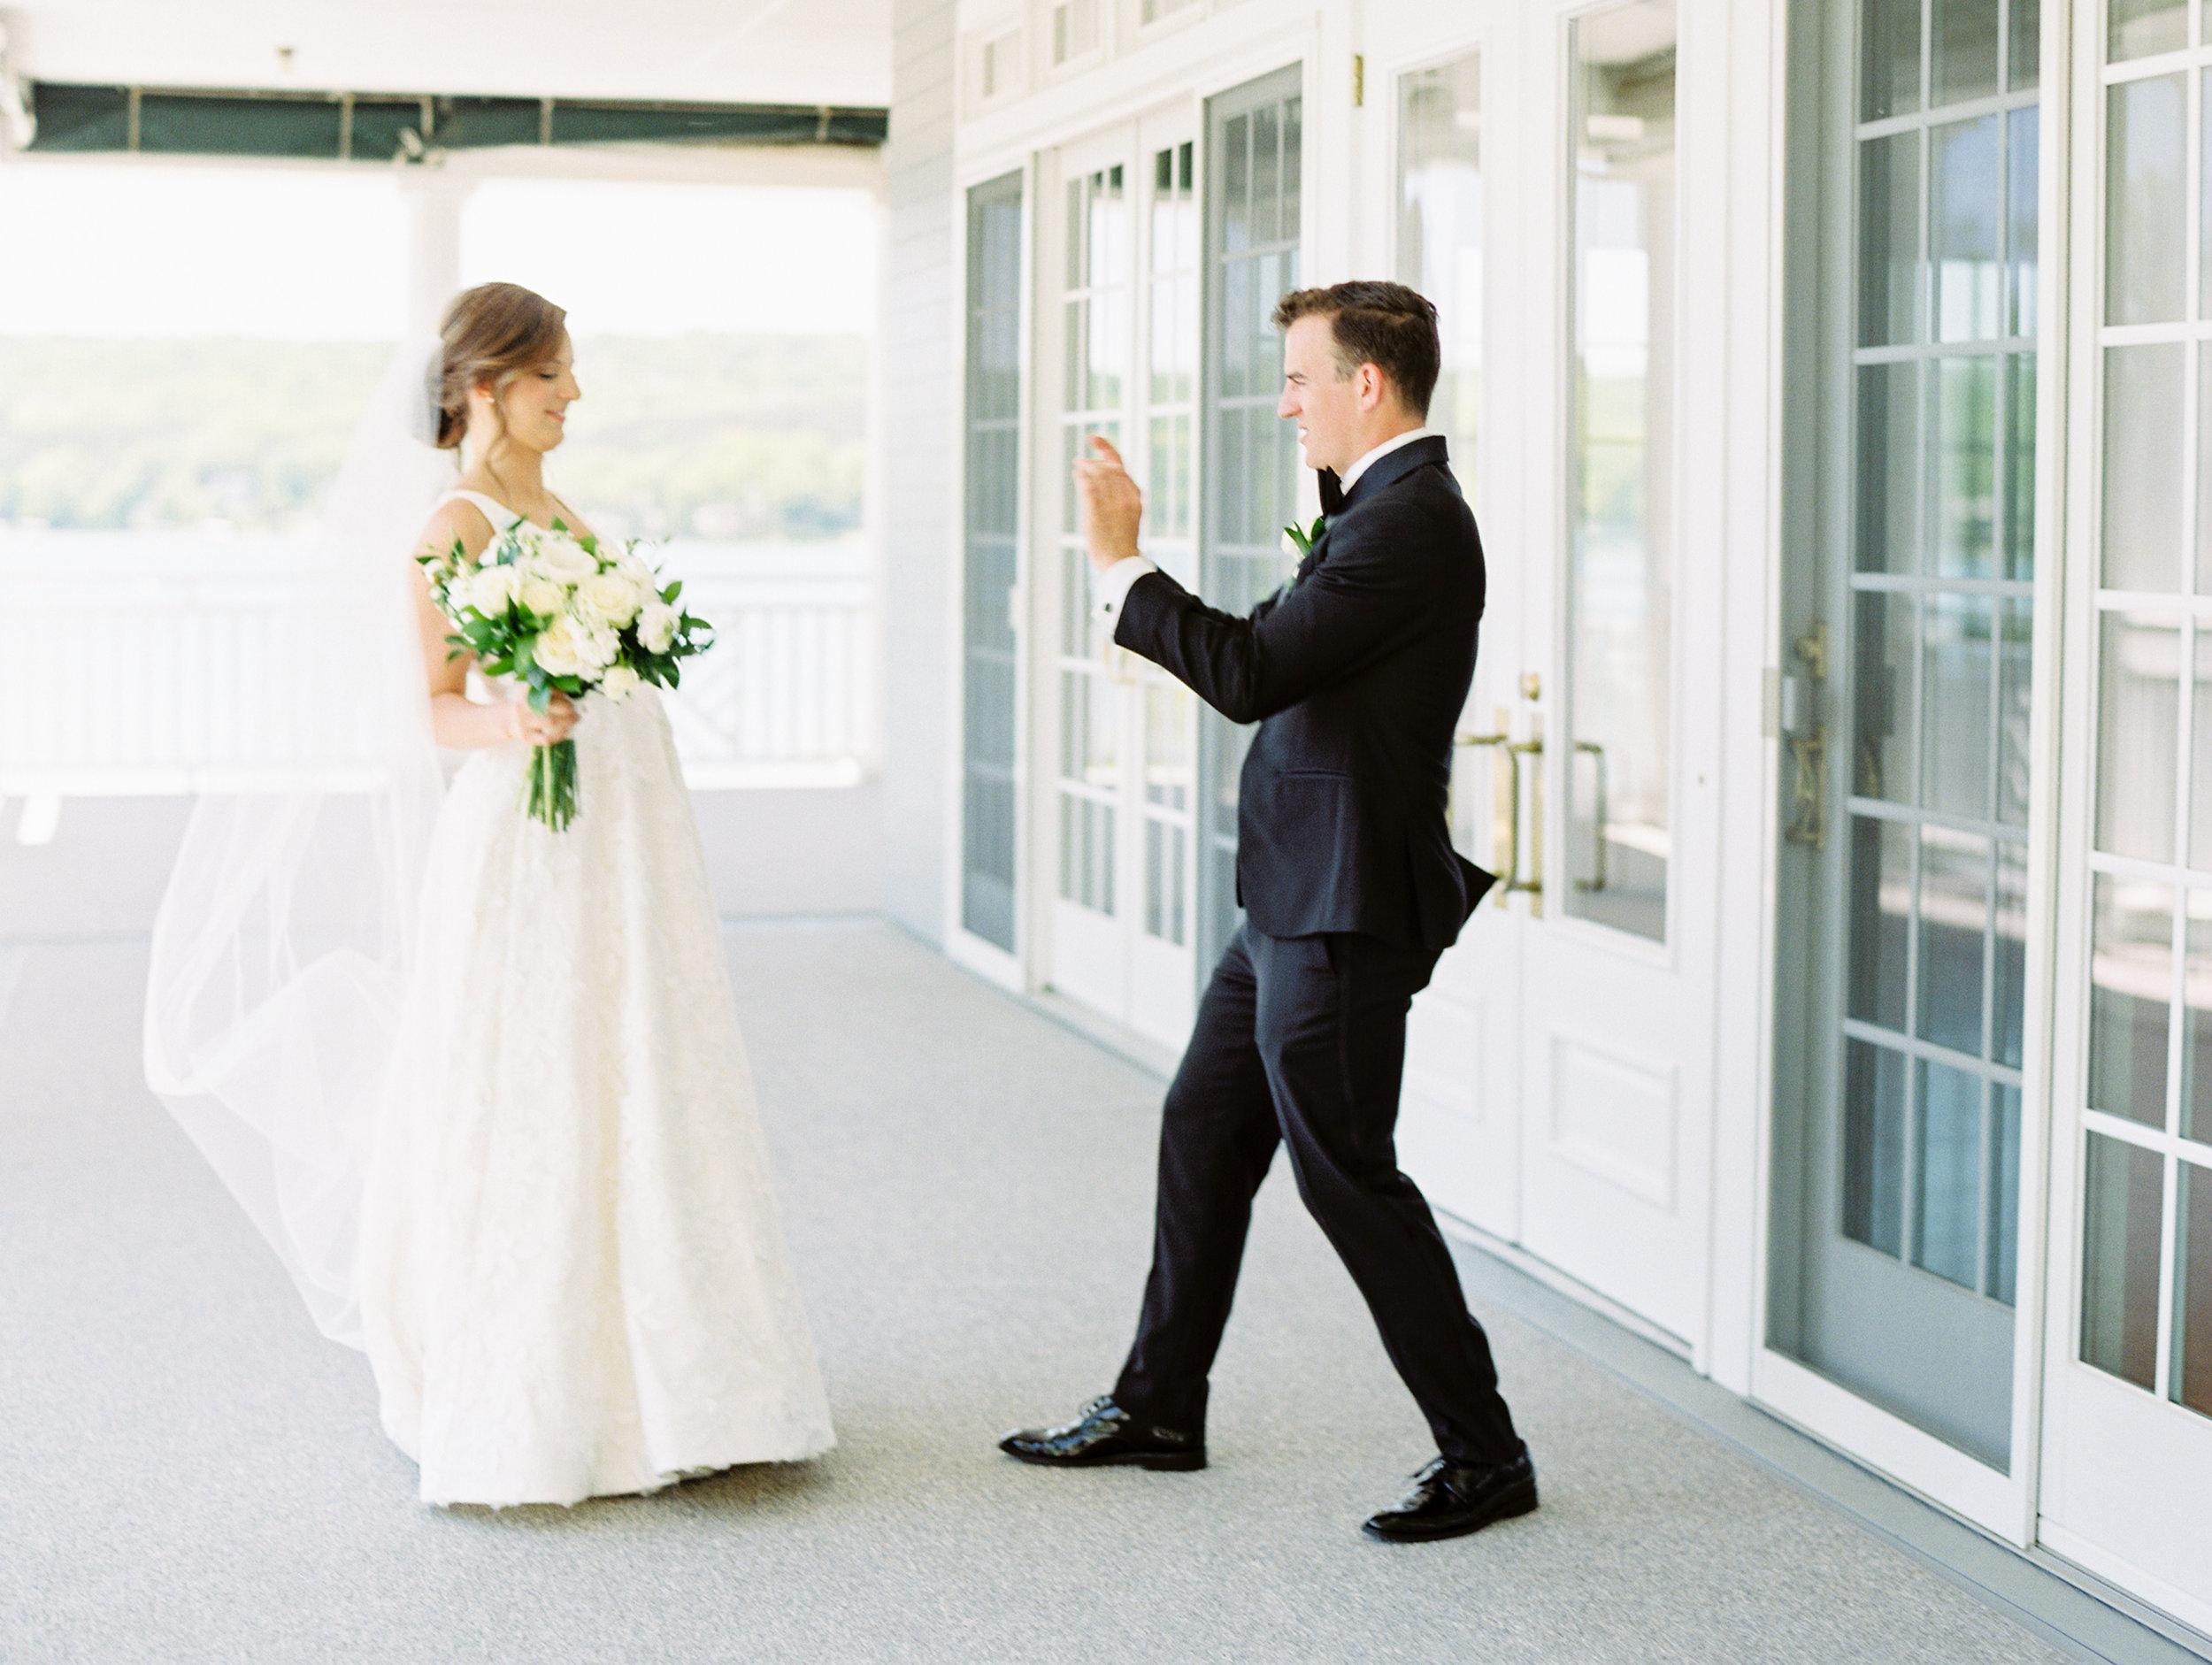 DeGuilio+Wedding+First+Lookf-2 copy.jpg